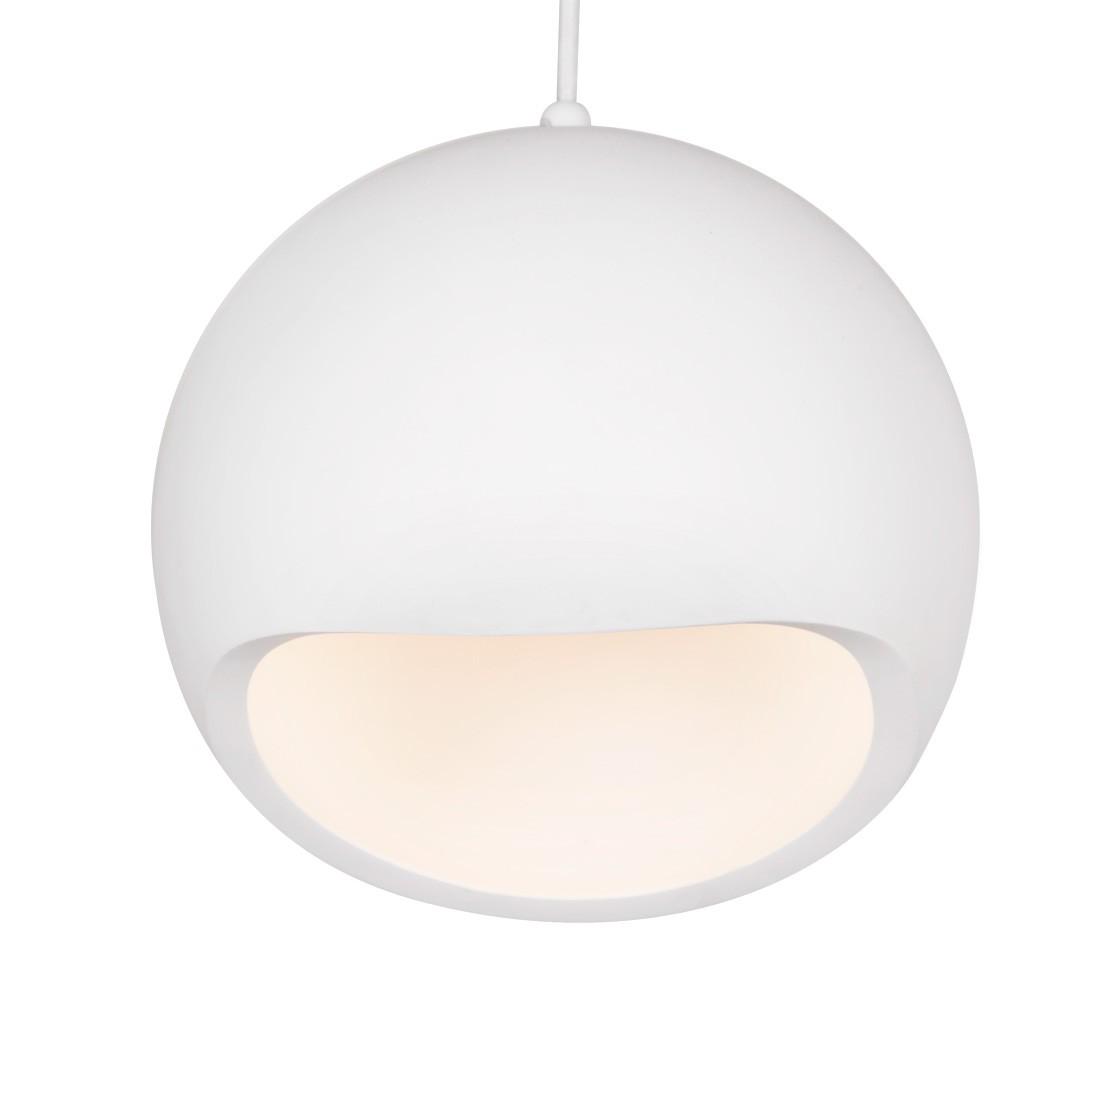 energie  A++, Hanglamp Aurora - gips - 1 lichtbron, Fredriks